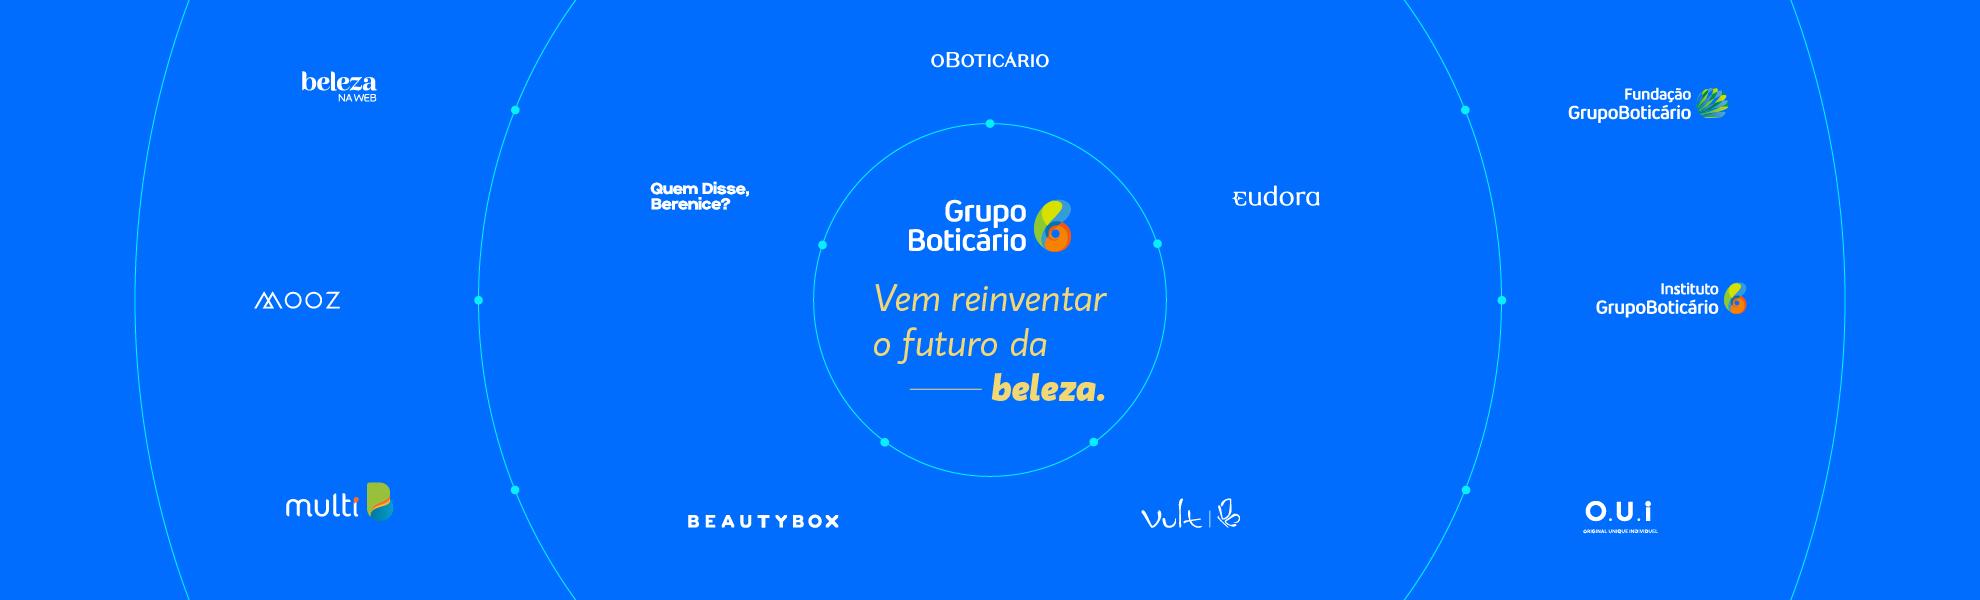 Executivo de Vendas II - Canal Indireto | Belo Horizonte